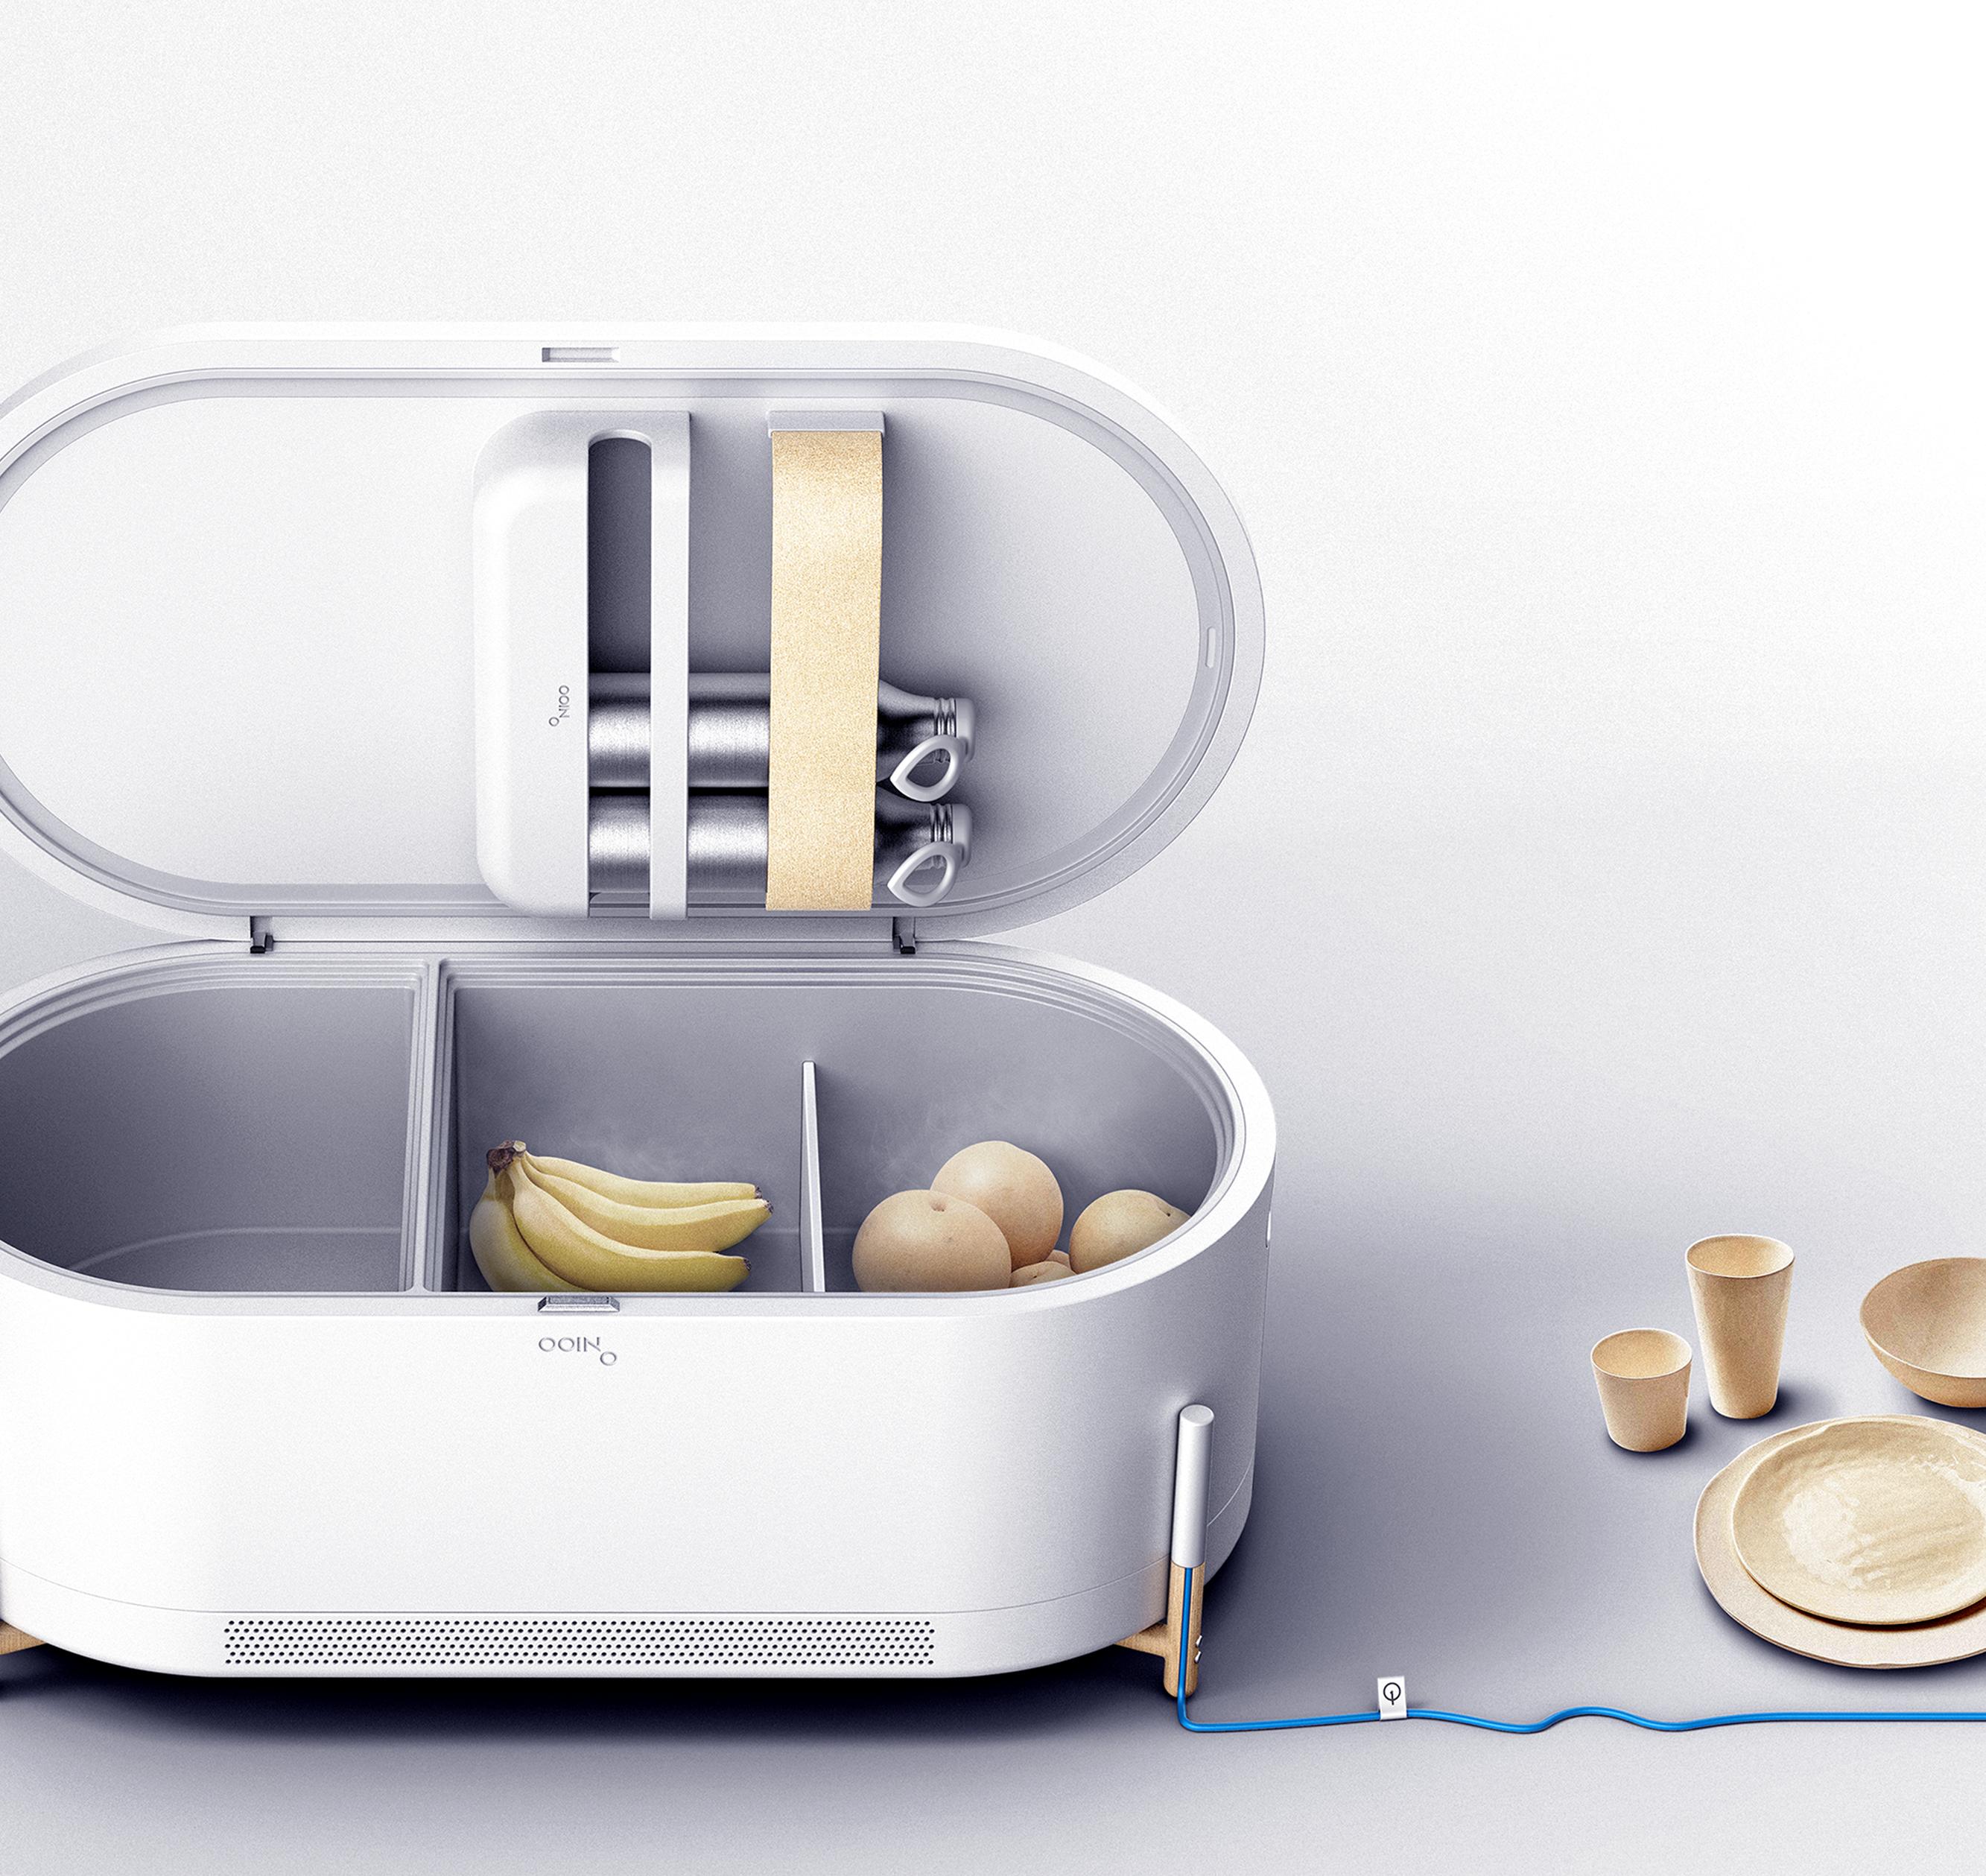 OOINO Mini Refrigerator on Behance 기능주의, 제품 디자인, 디자인